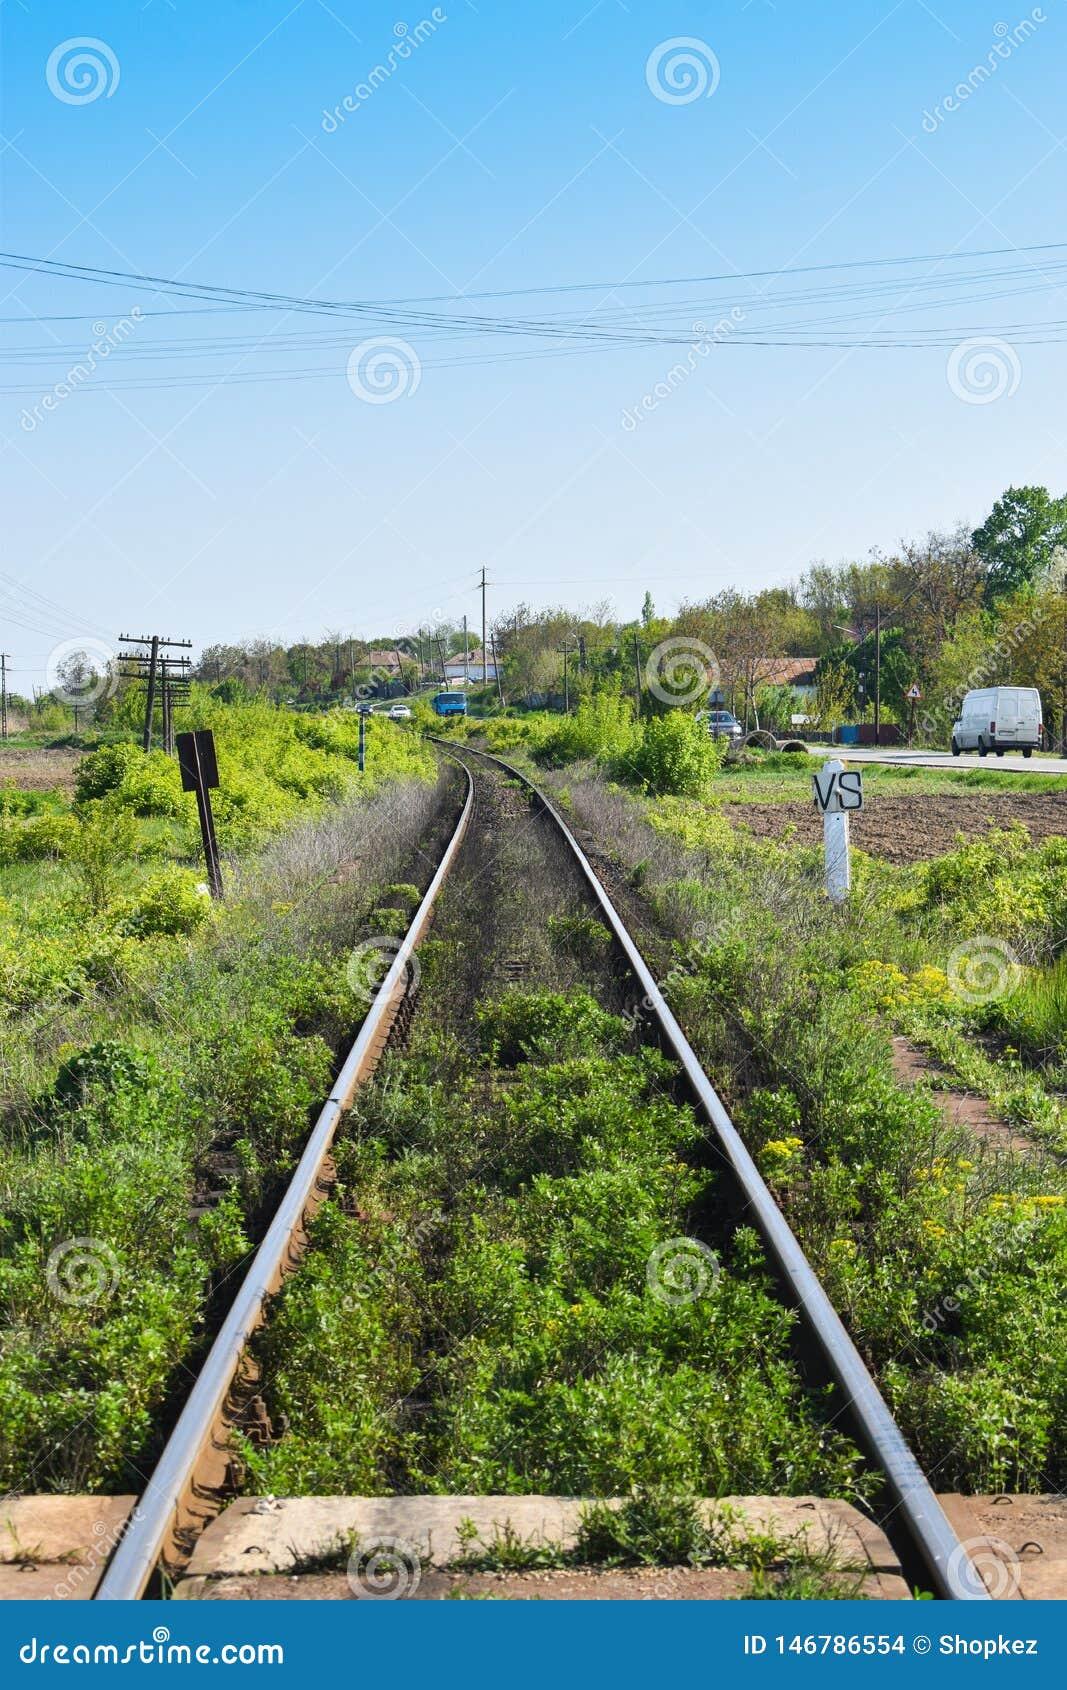 Long straight rails with vegetation